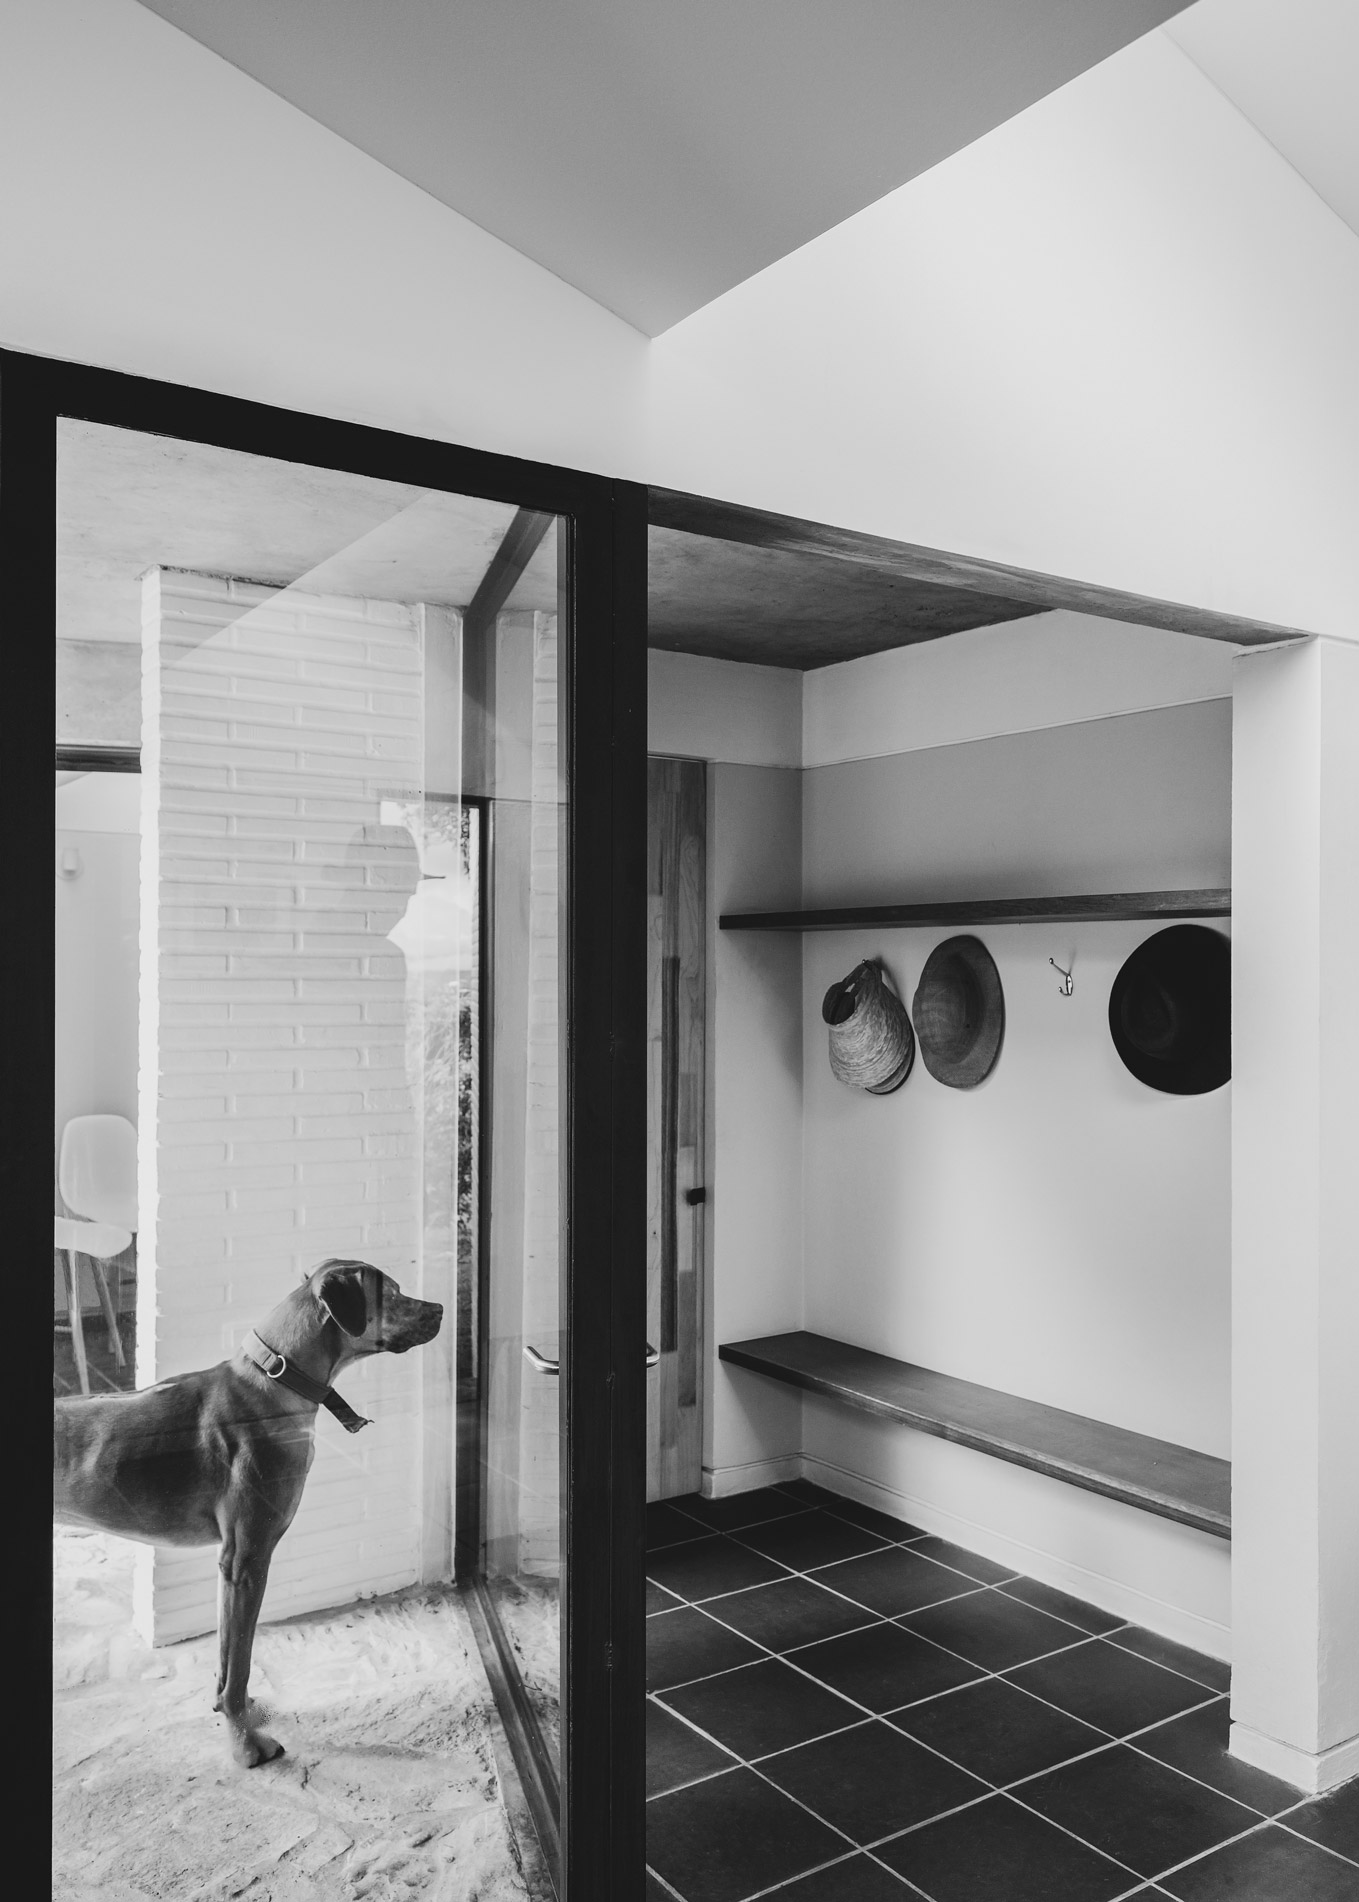 11-oberleander.lucas.simon.bosch.photography.colombia.bogota.arquitectura.diseño.fotografia